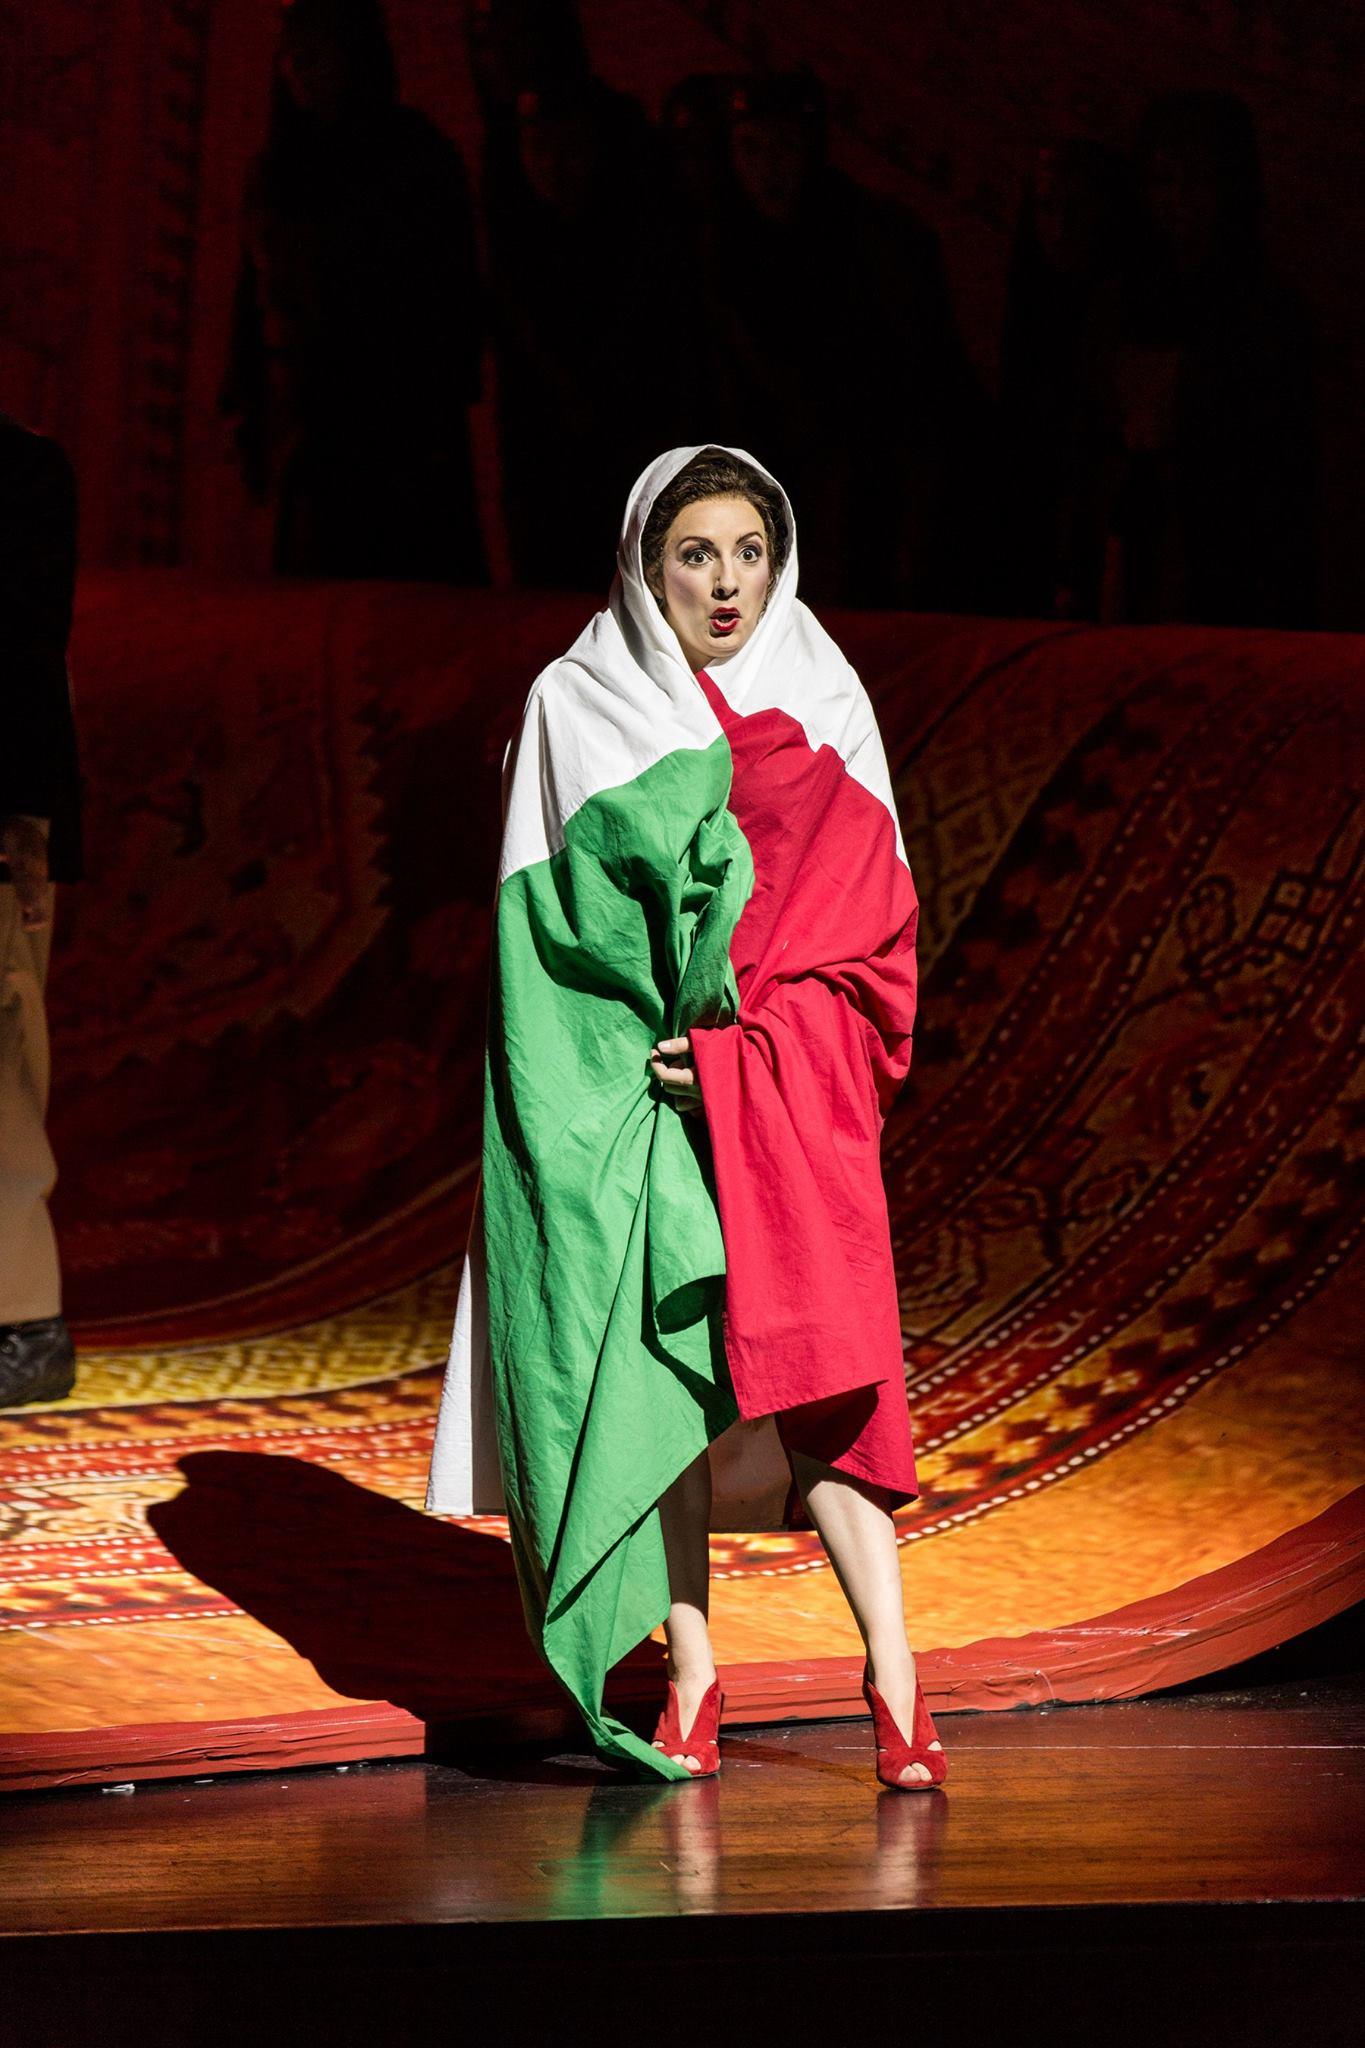 portland italian girl 4.jpg